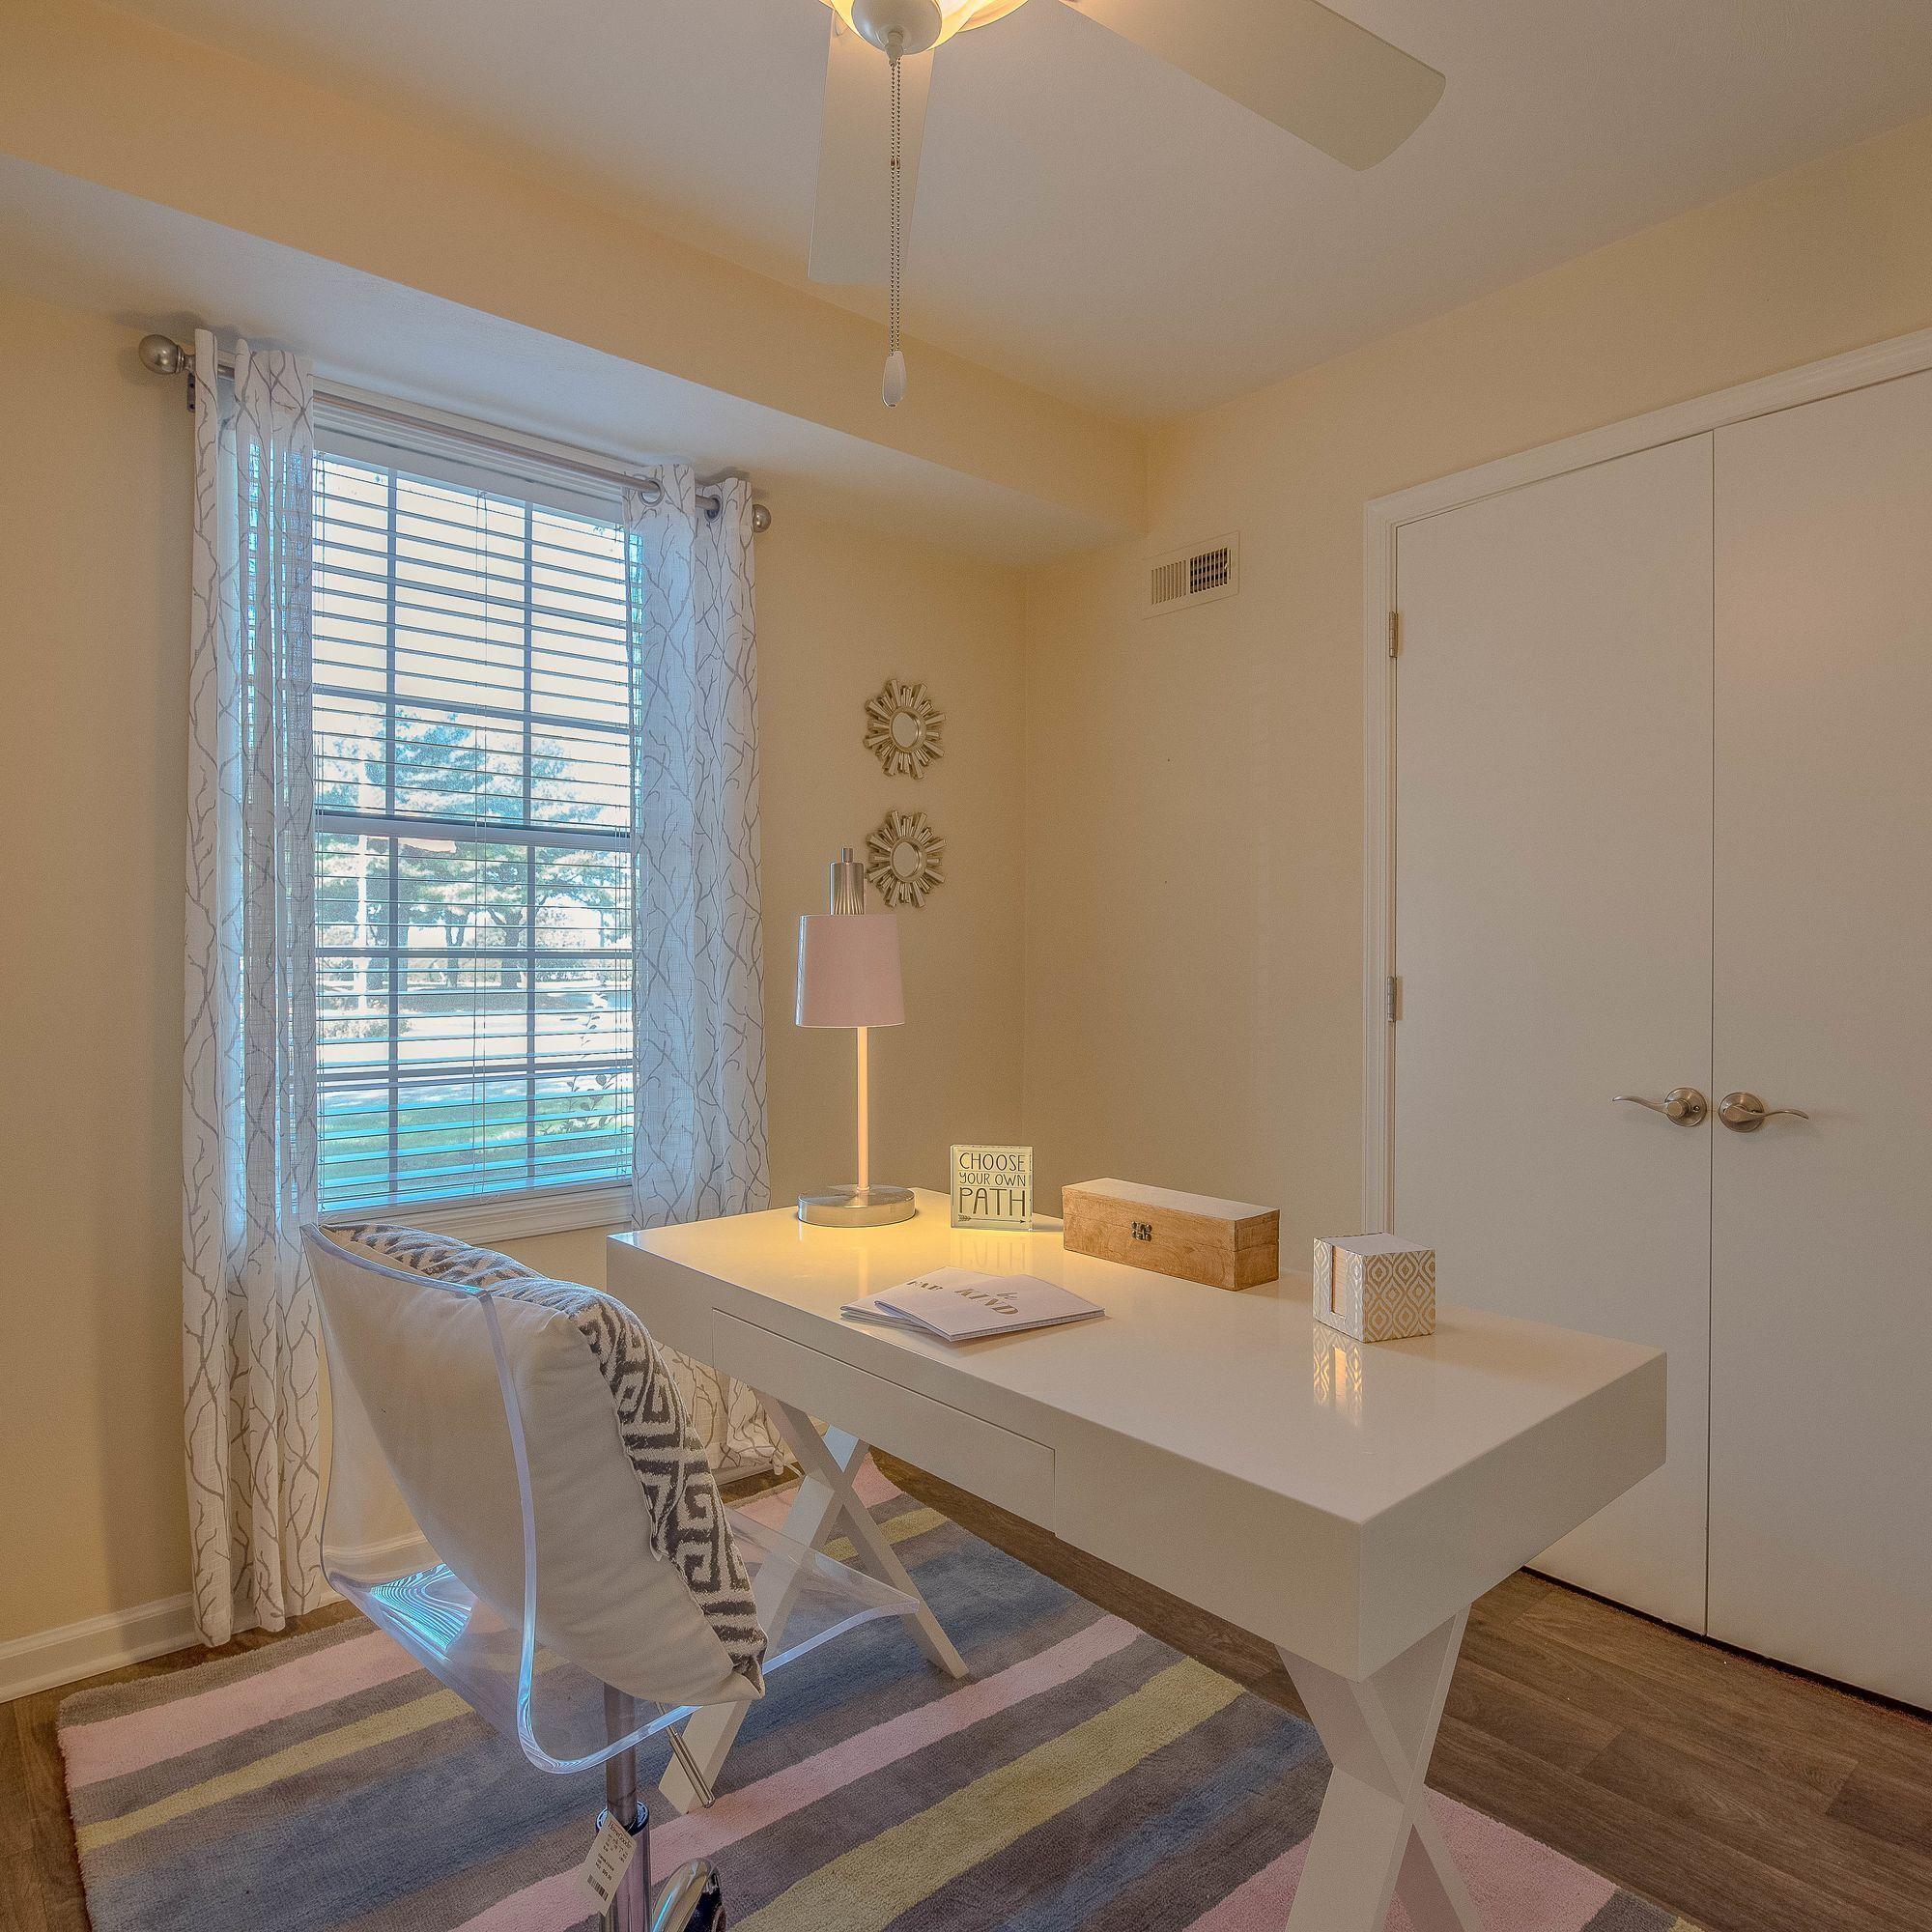 Virginia Beach Apartments For Rent: Virginia Beach, VA Apartments For Rent